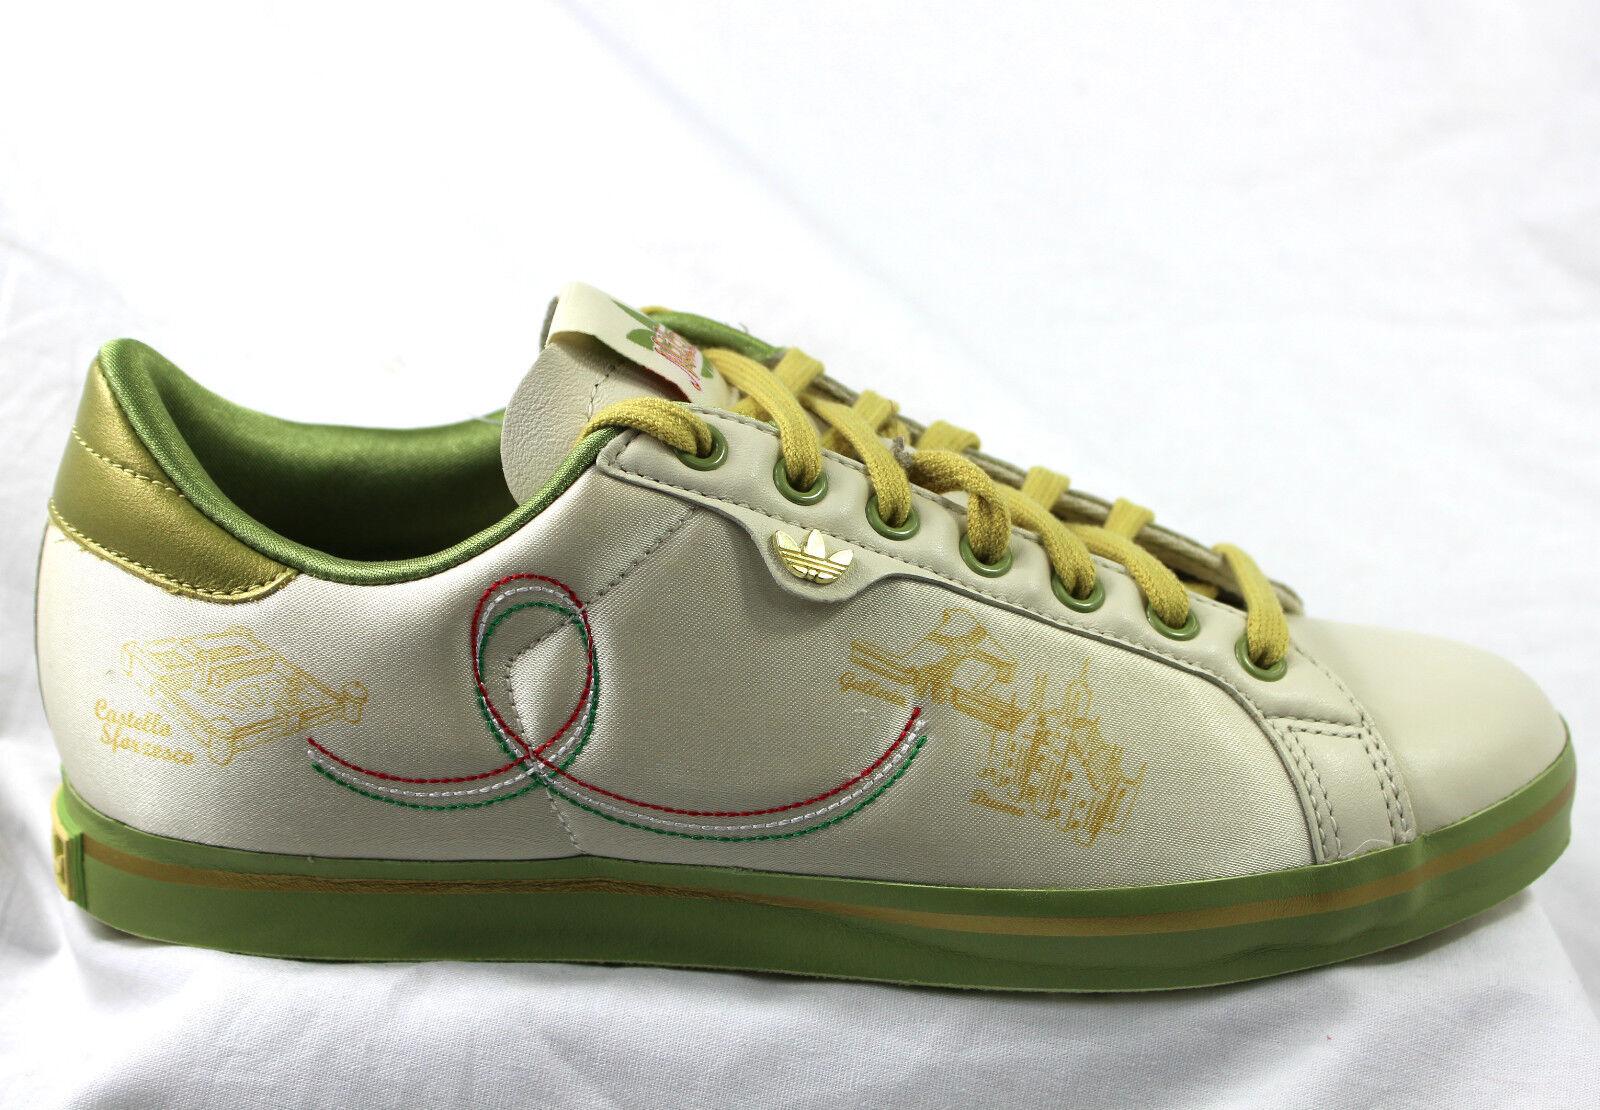 Adidas Rod Laver Vintage Milano 562425 UK 4.5, 5, 5.5 BNIB & 6 Deadstock 2006 BNIB 5.5 f12ccc